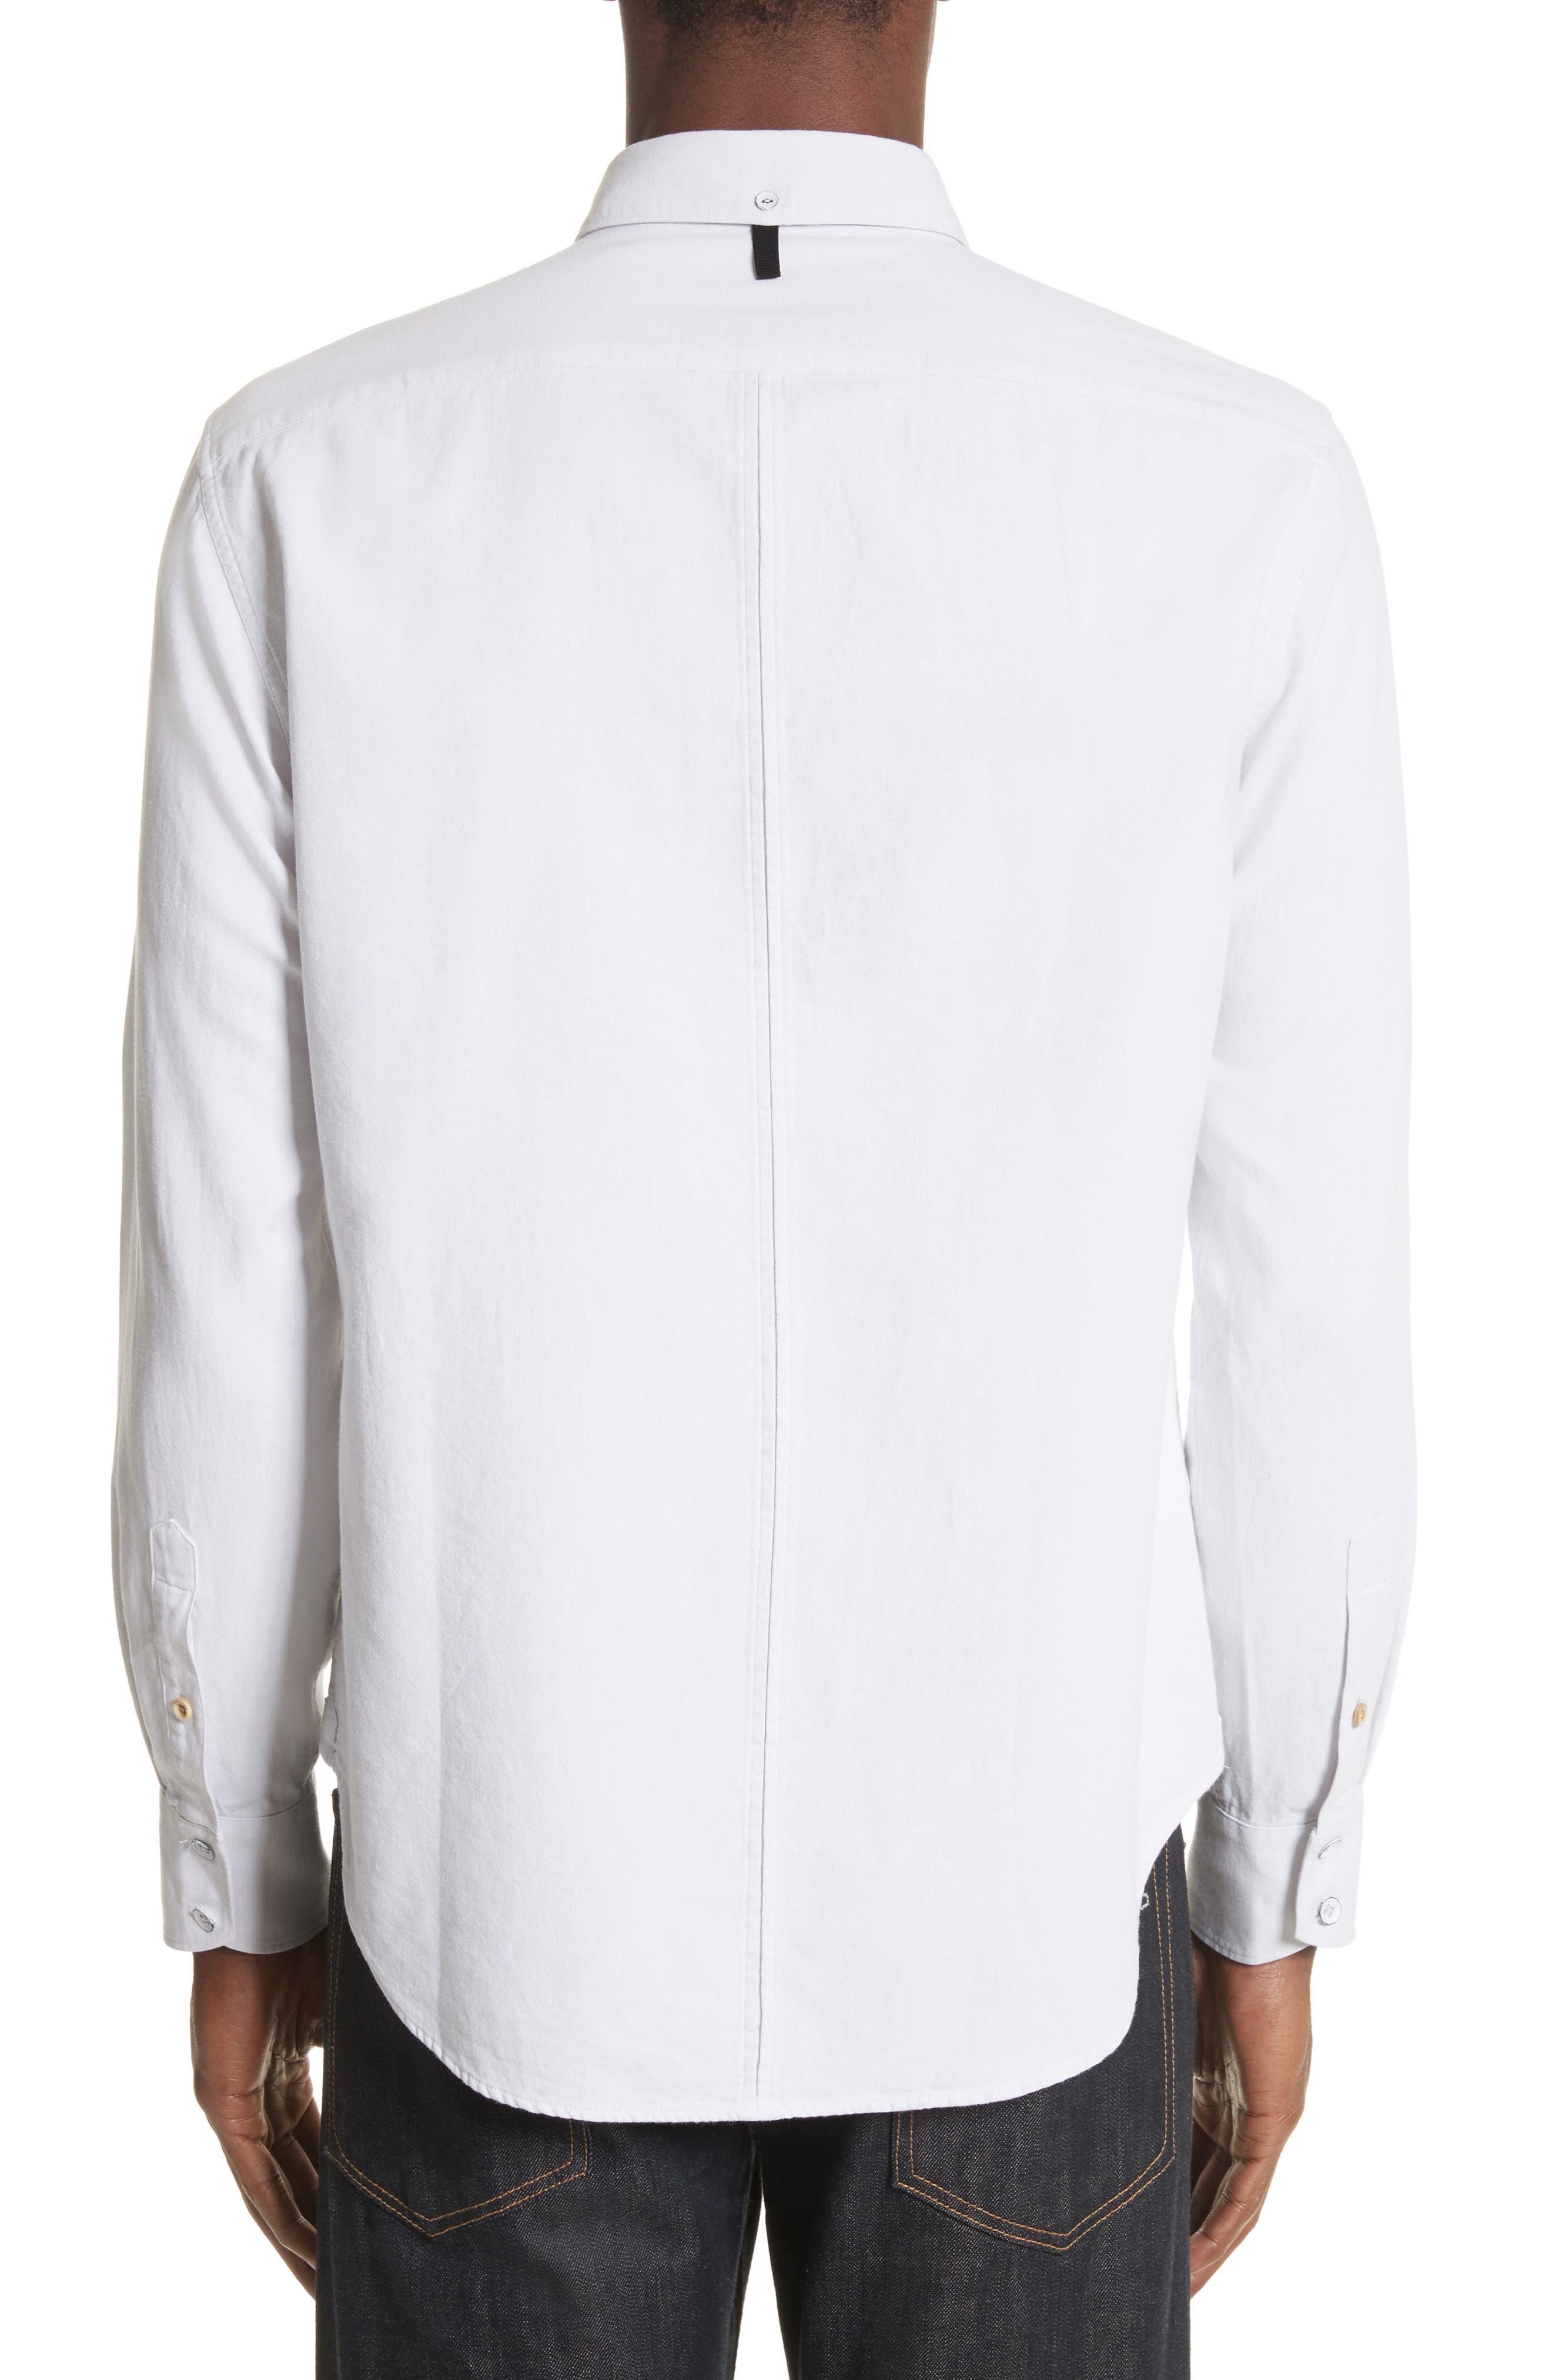 RAG & BONE,                             Tomlin Fit 2 Shirt,                             Alternate thumbnail 3, color,                             179